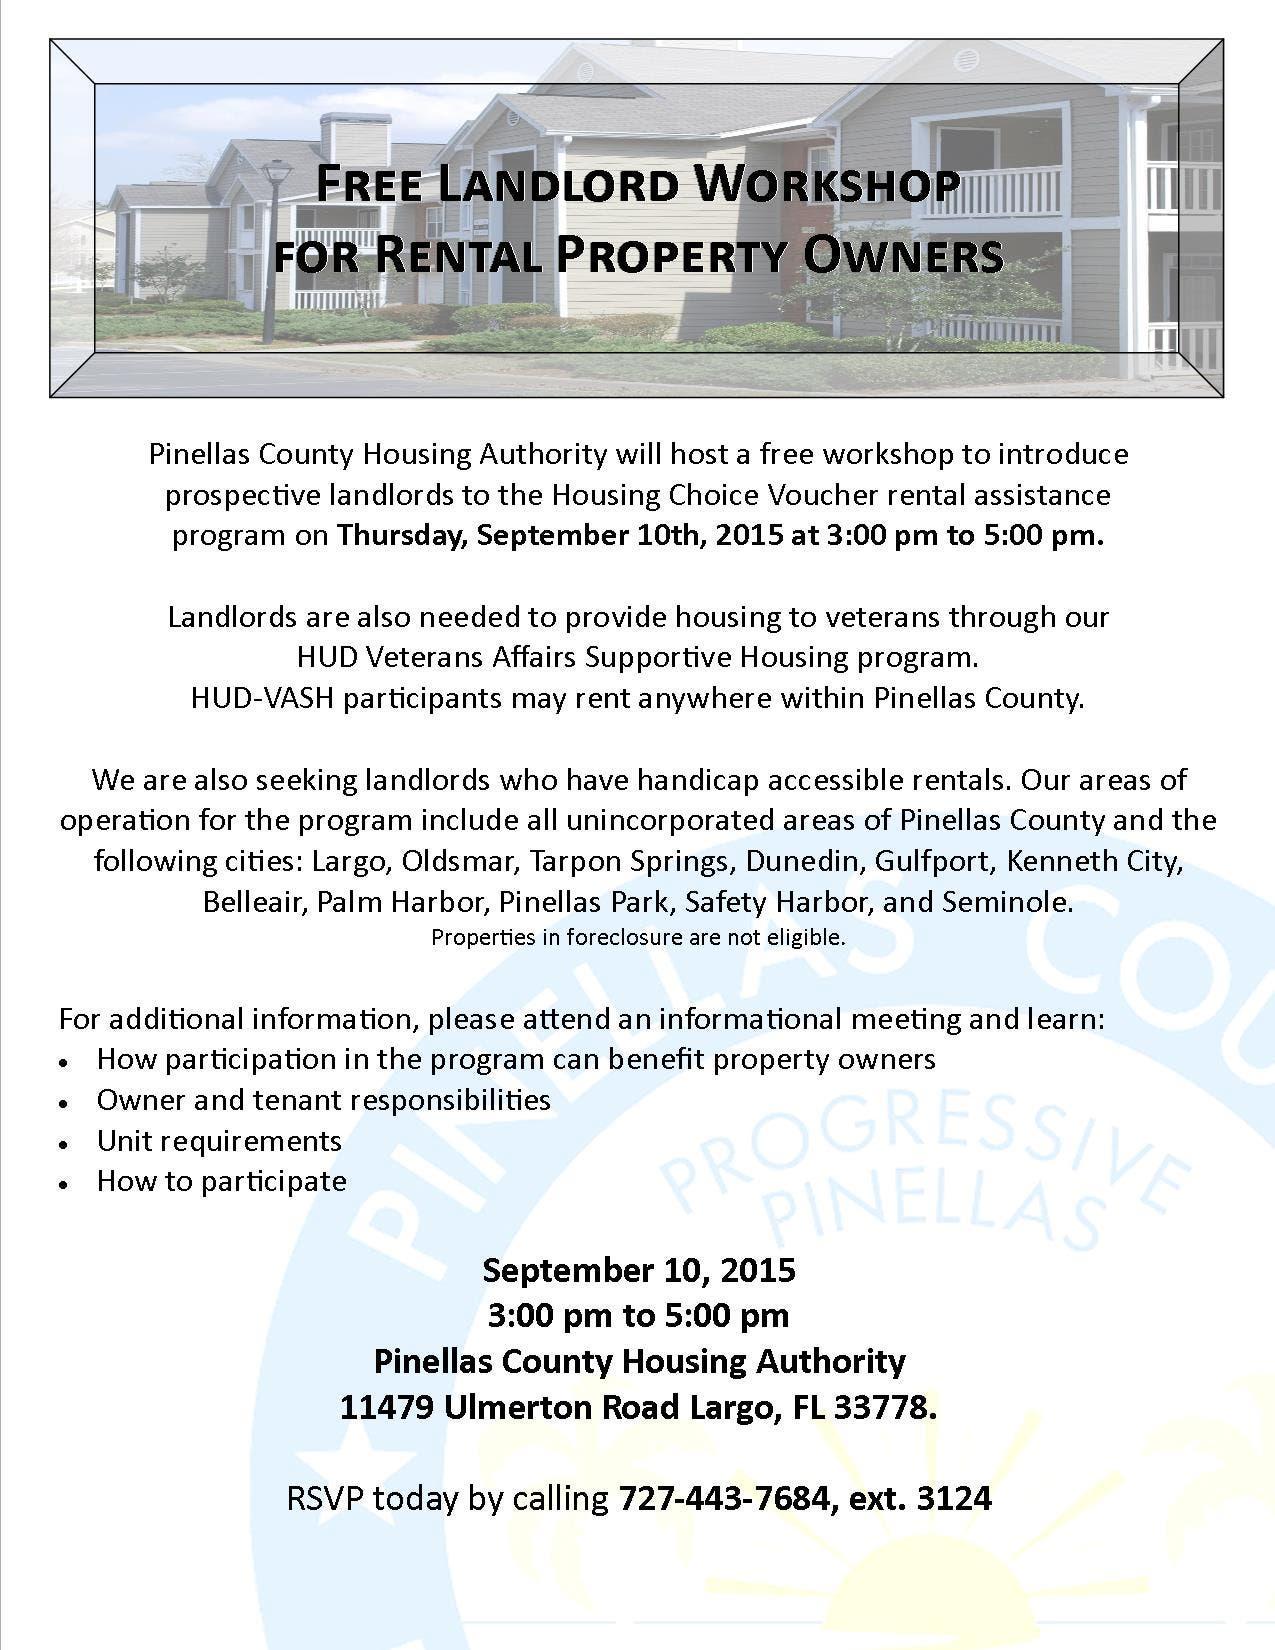 Free Landlord Workshop for Rental Property Owners | Largo